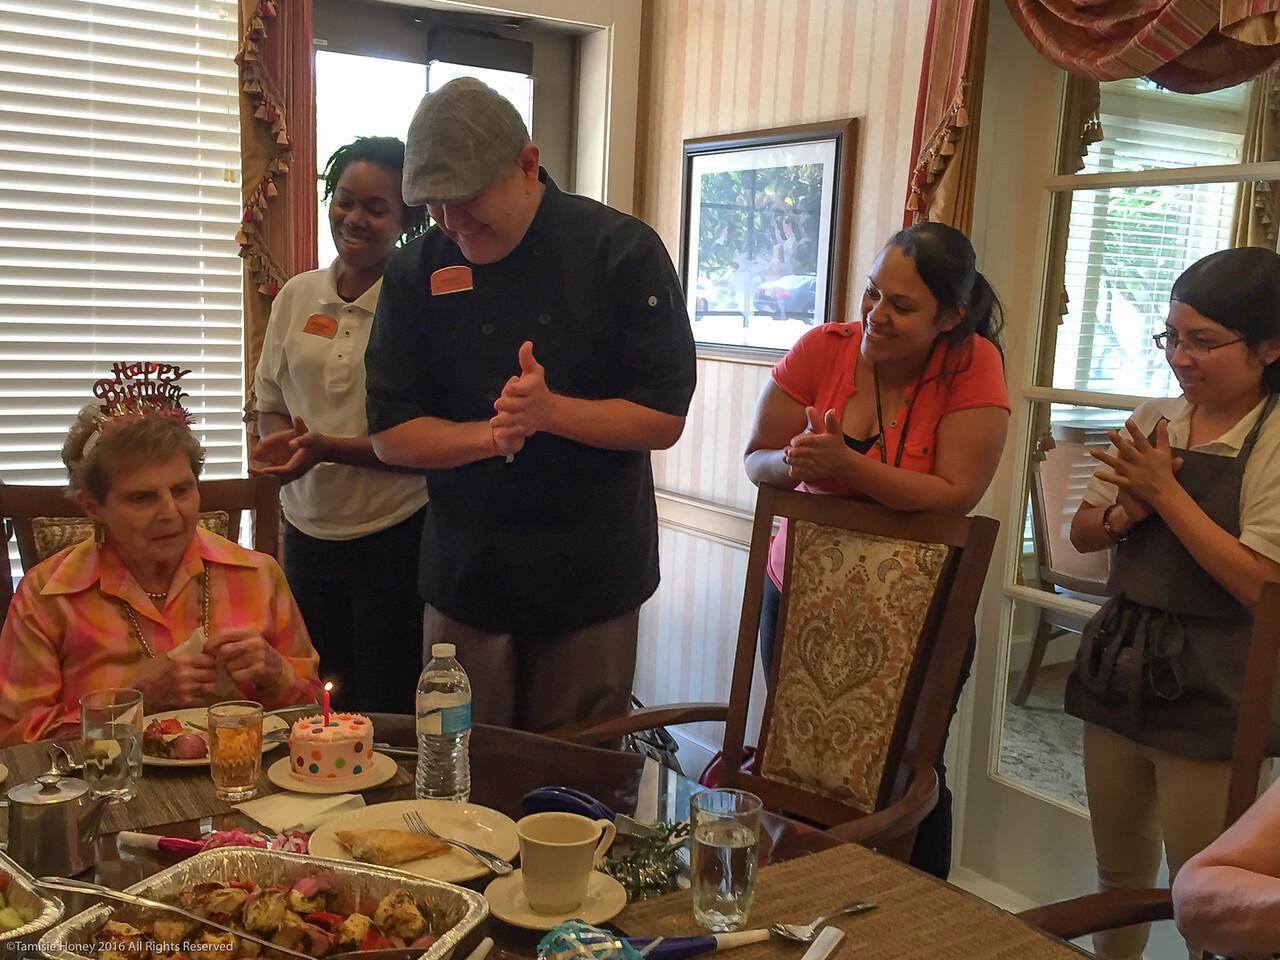 Joan Honey Phillips' 88th Birthday with Sunrise staff and Birthday Cake